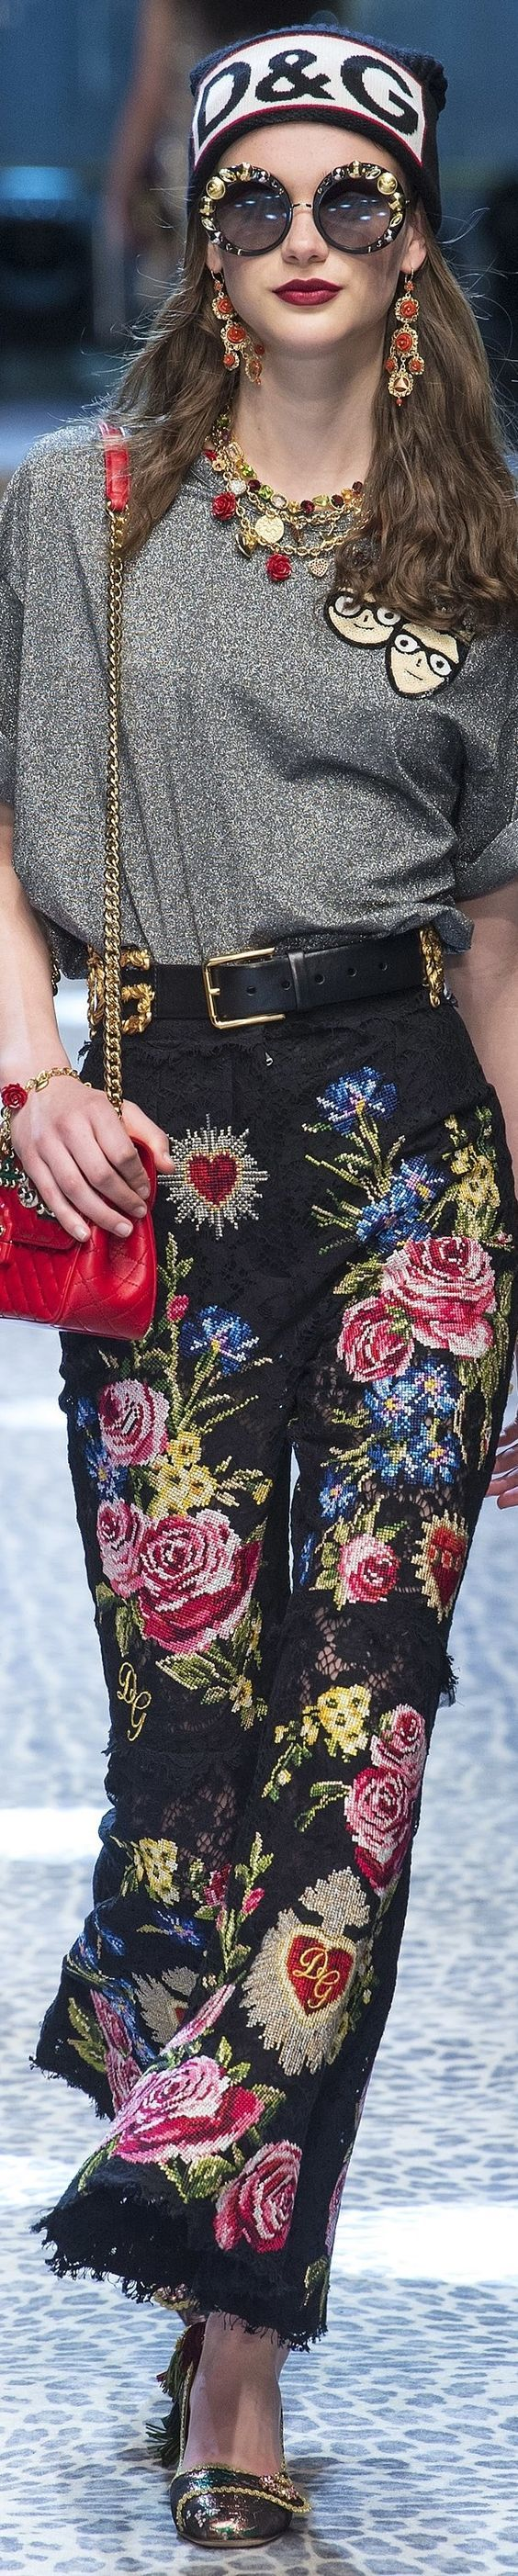 Dolce & Gabbana Fall 2017 Fashion Luxury Details